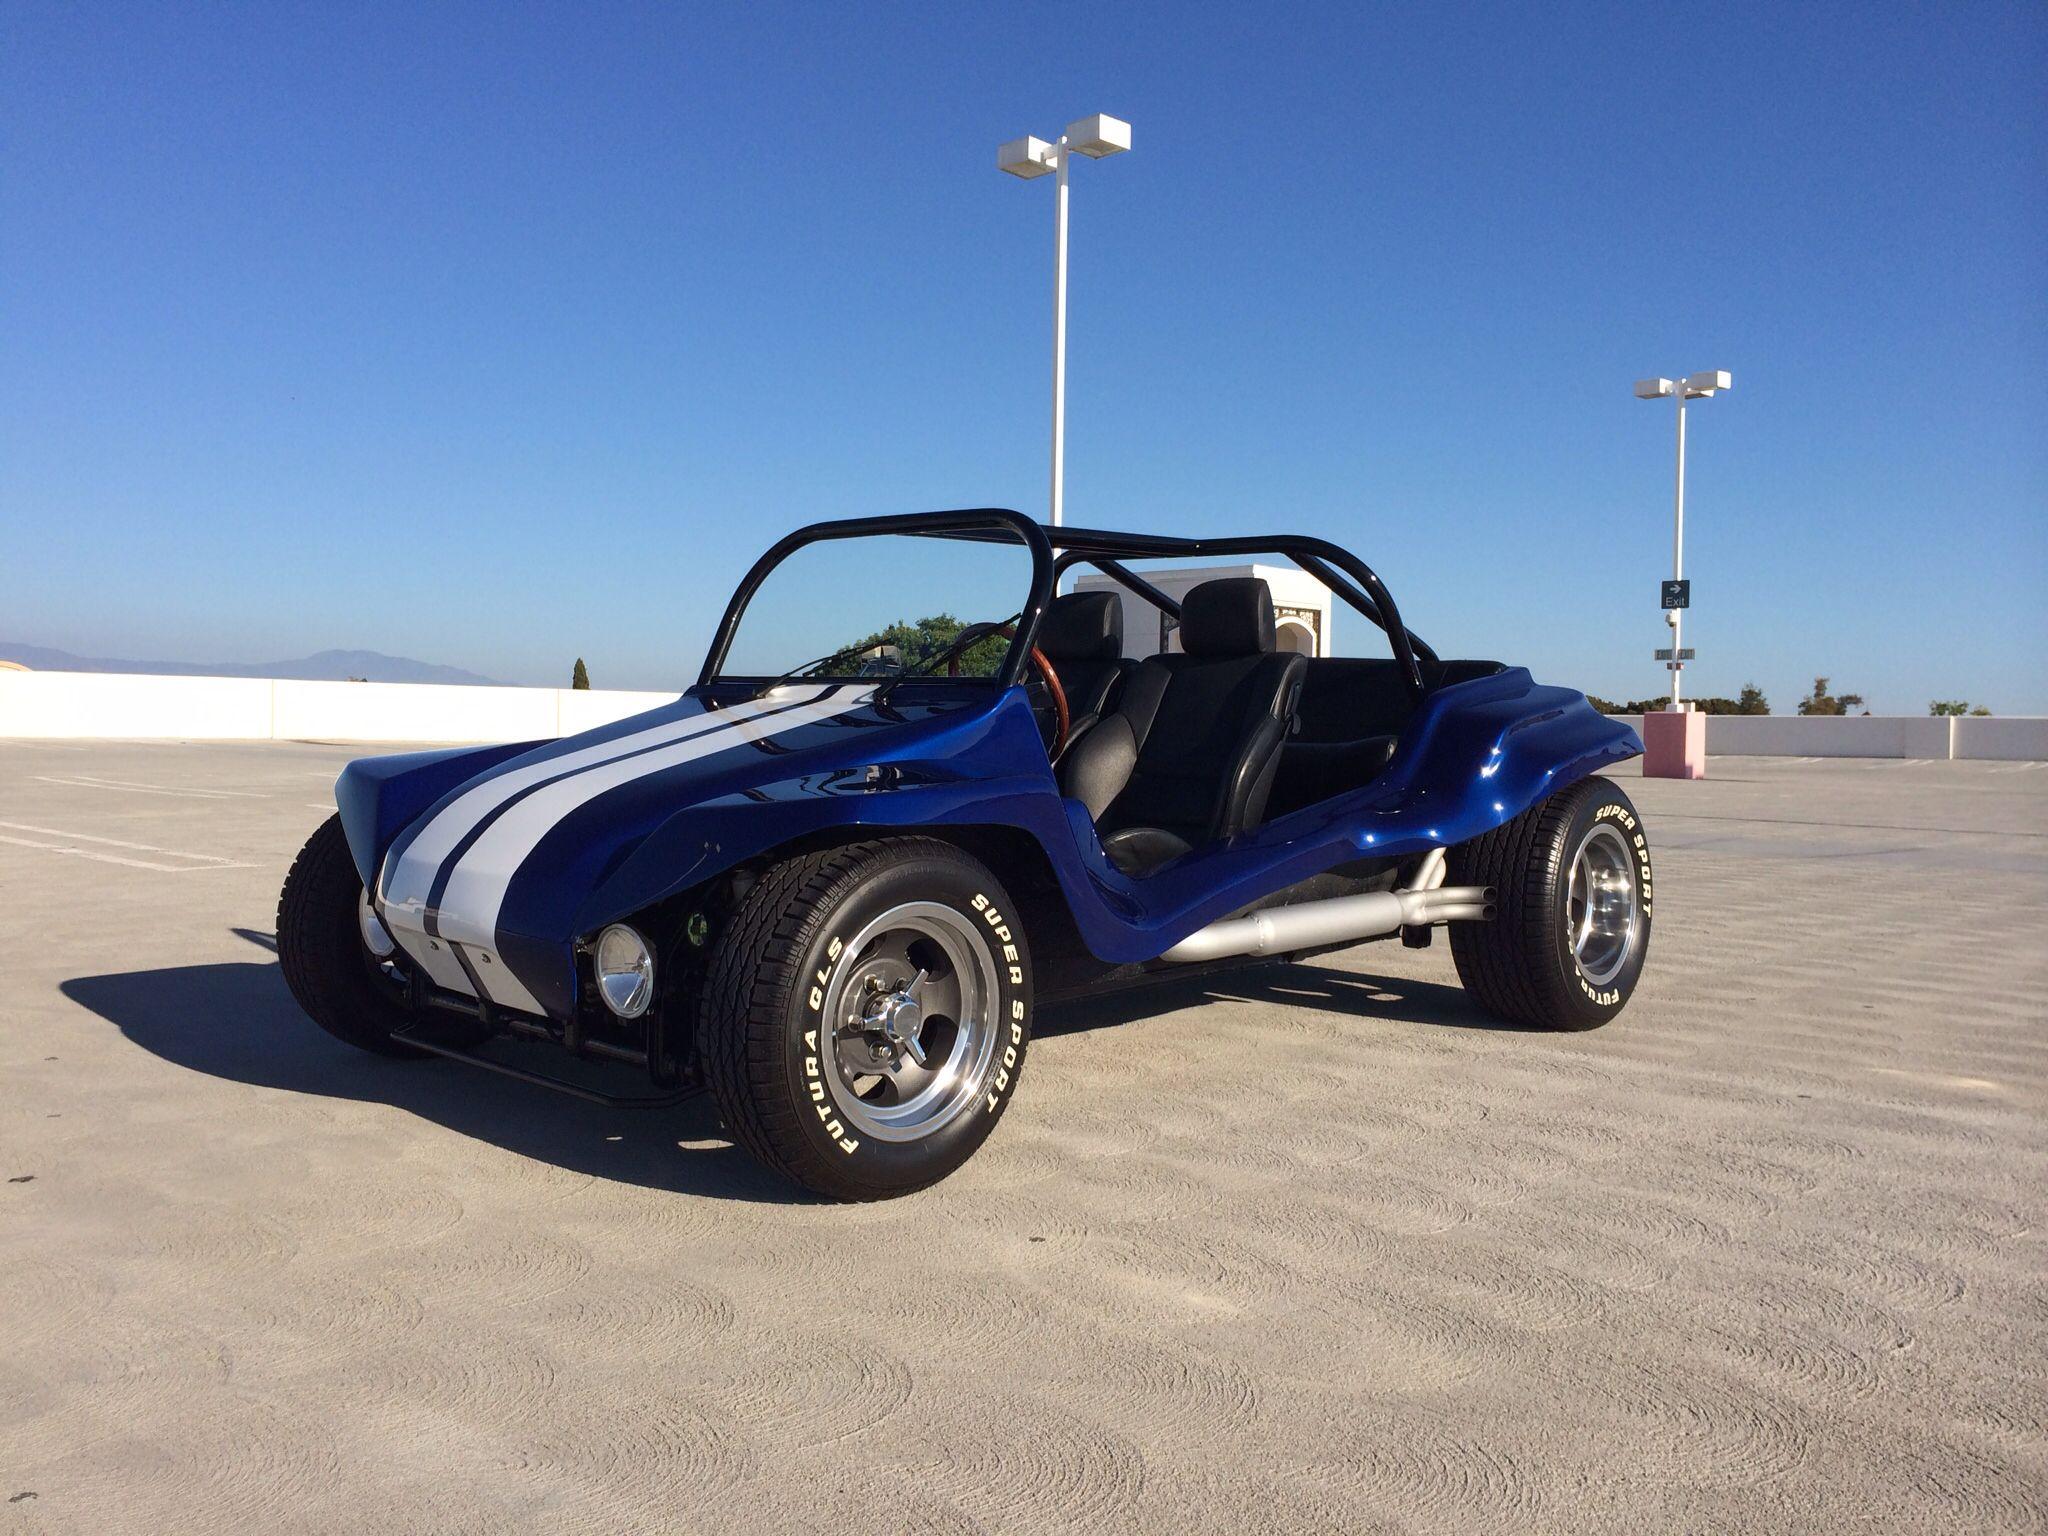 Vw Street Buggy Builder Us Caird Dune Buggies Baja Bug